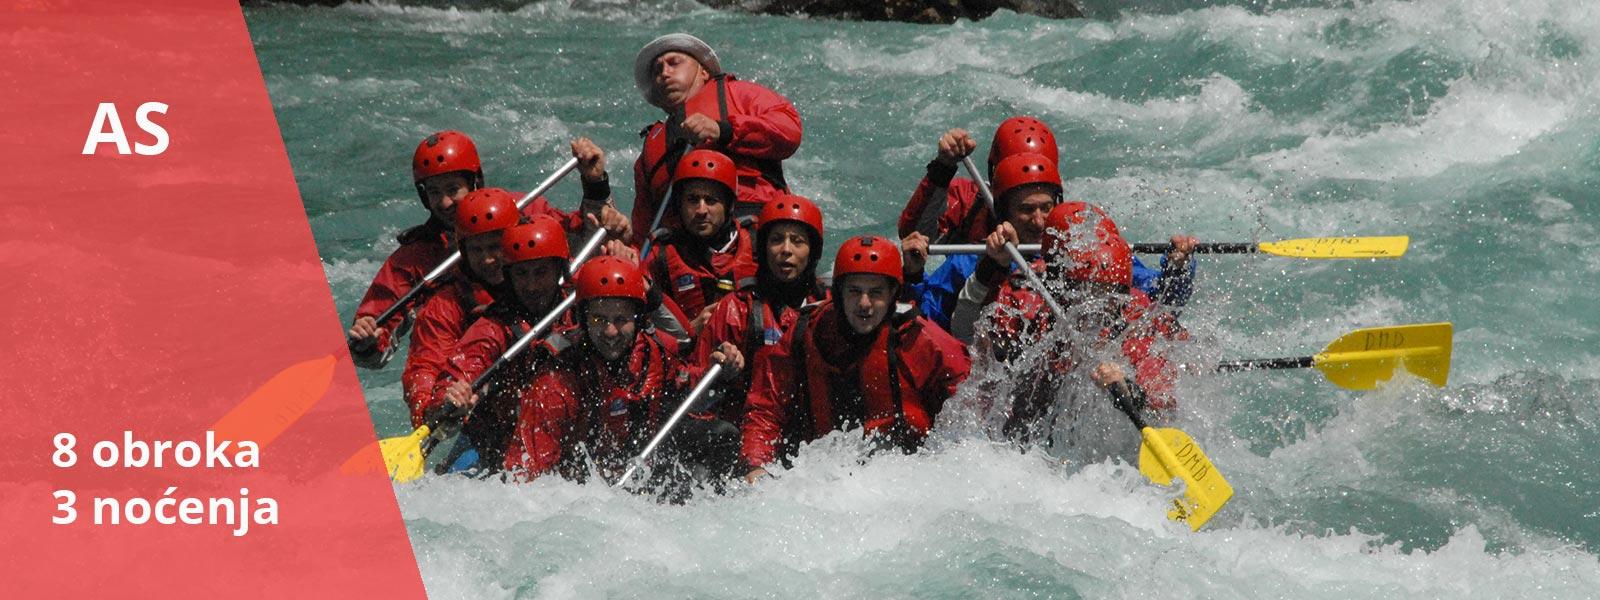 Rafting aranzman Adrenalin Specijal